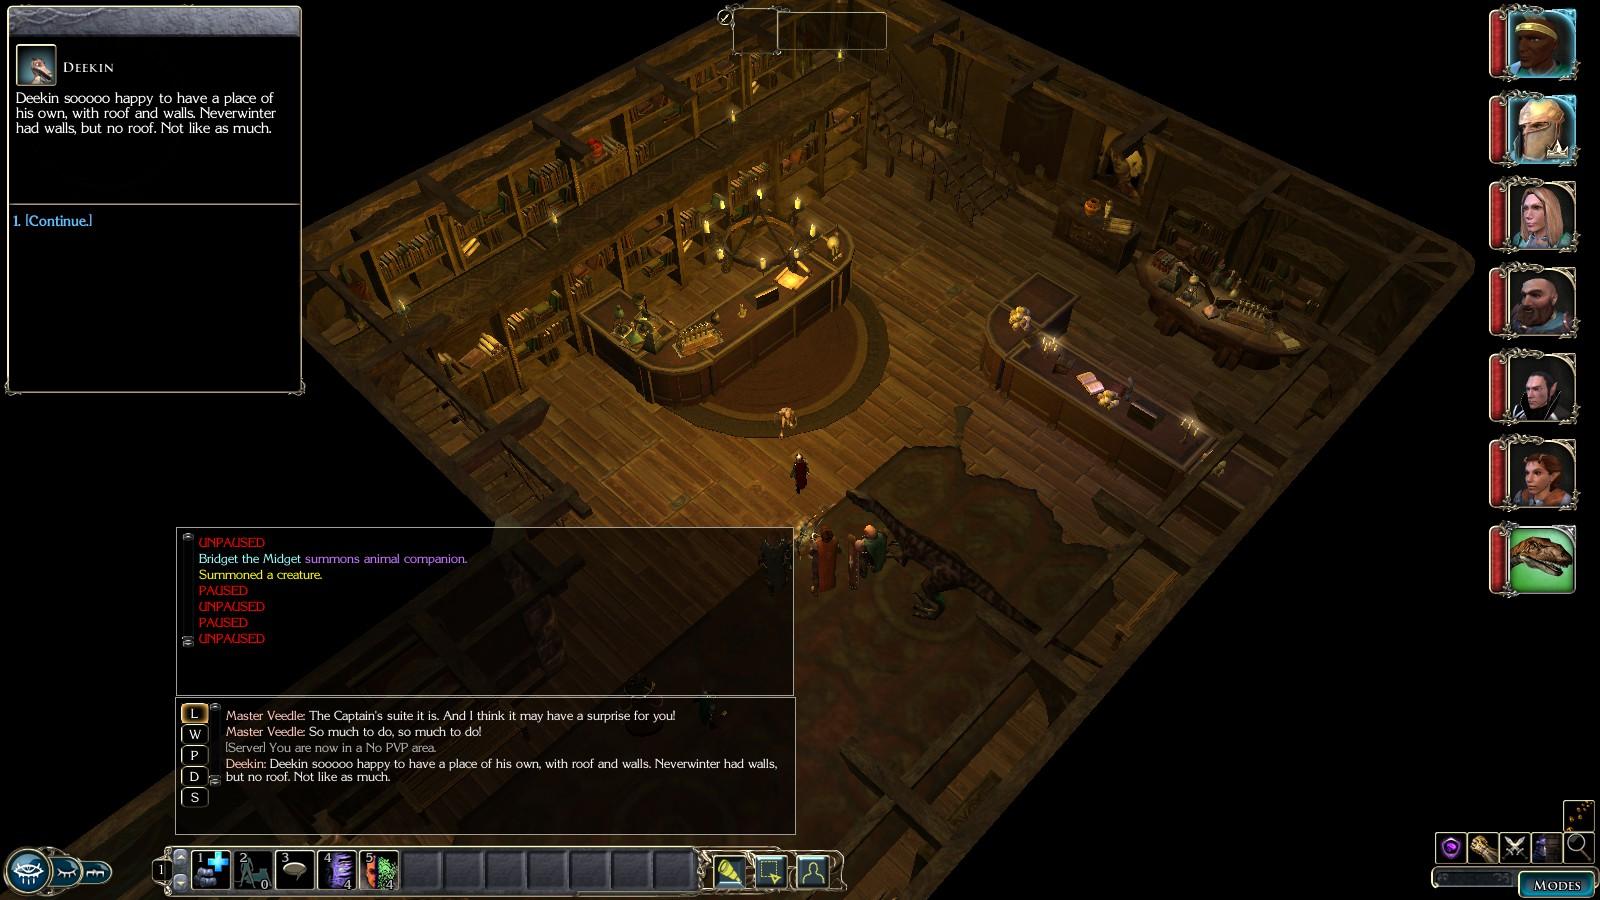 Neverwinter Nights images Neverwinter Nights 2 Playthrough HD